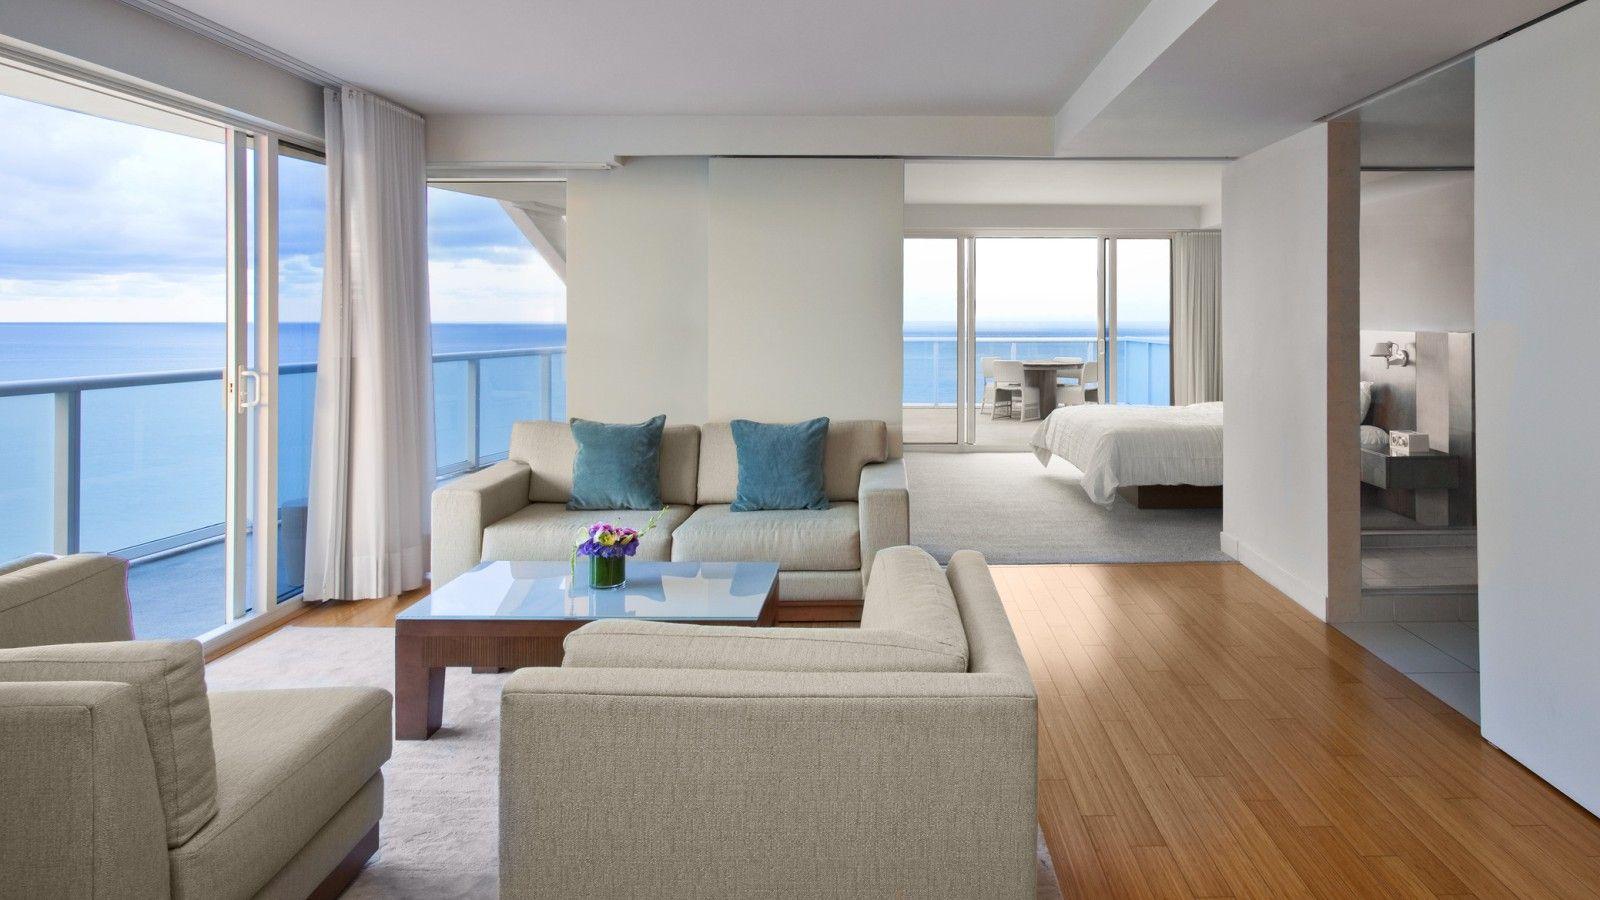 W Fort Lauderdale Fantastic Suite Fort Lauderdale Hotels Sarasota Hotels Fort Lauderdale